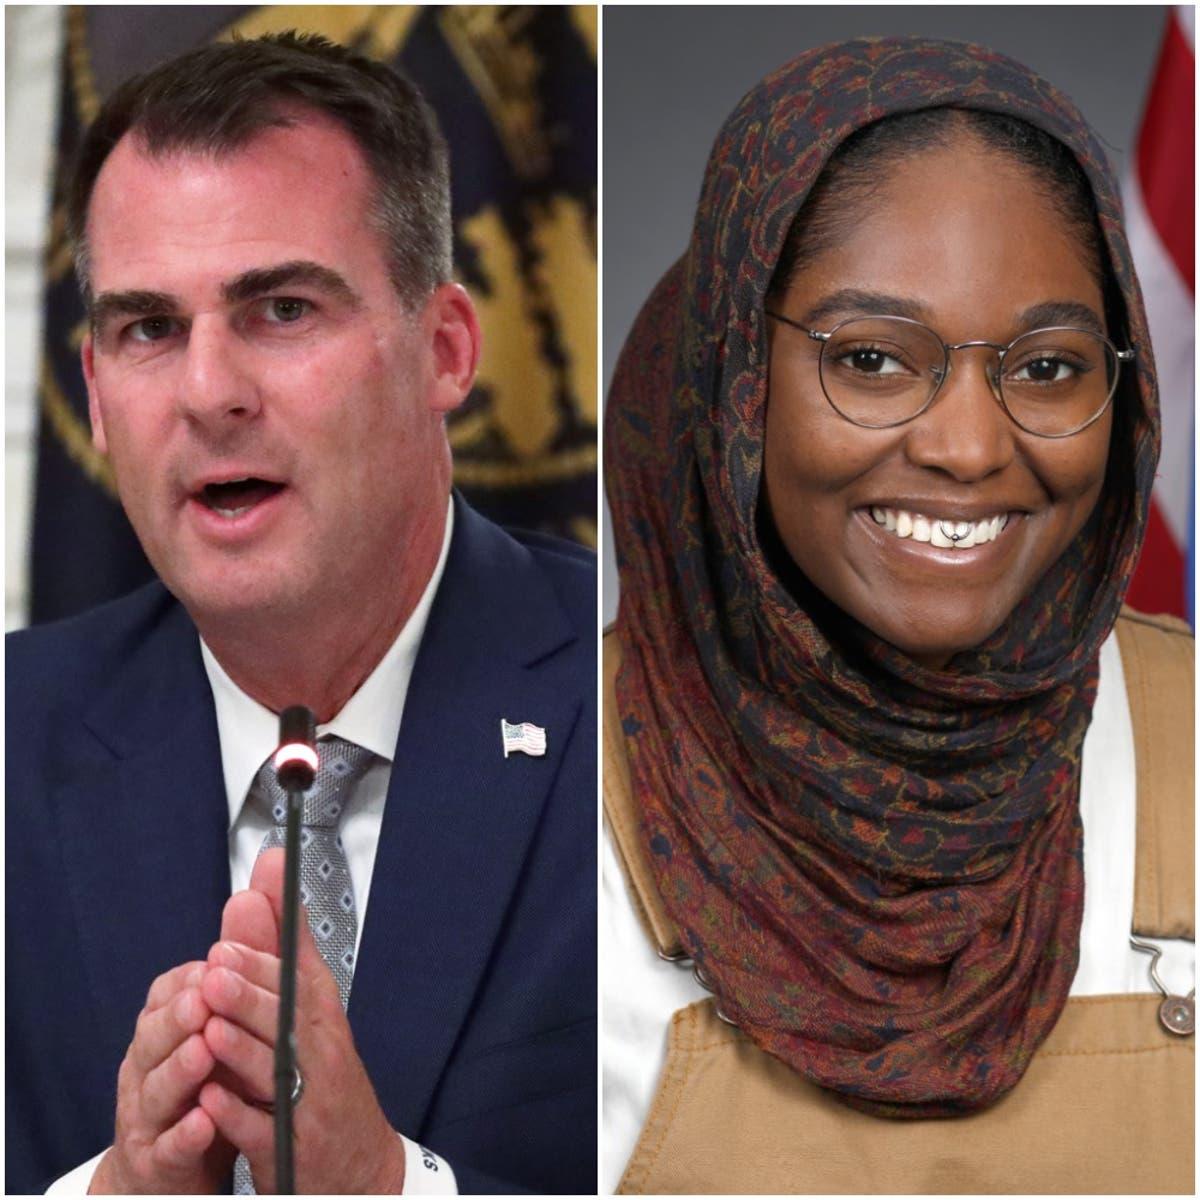 Nonbinary lawmaker and advocates criticise Oklahoma GOP for 'dangerous' rhetoric